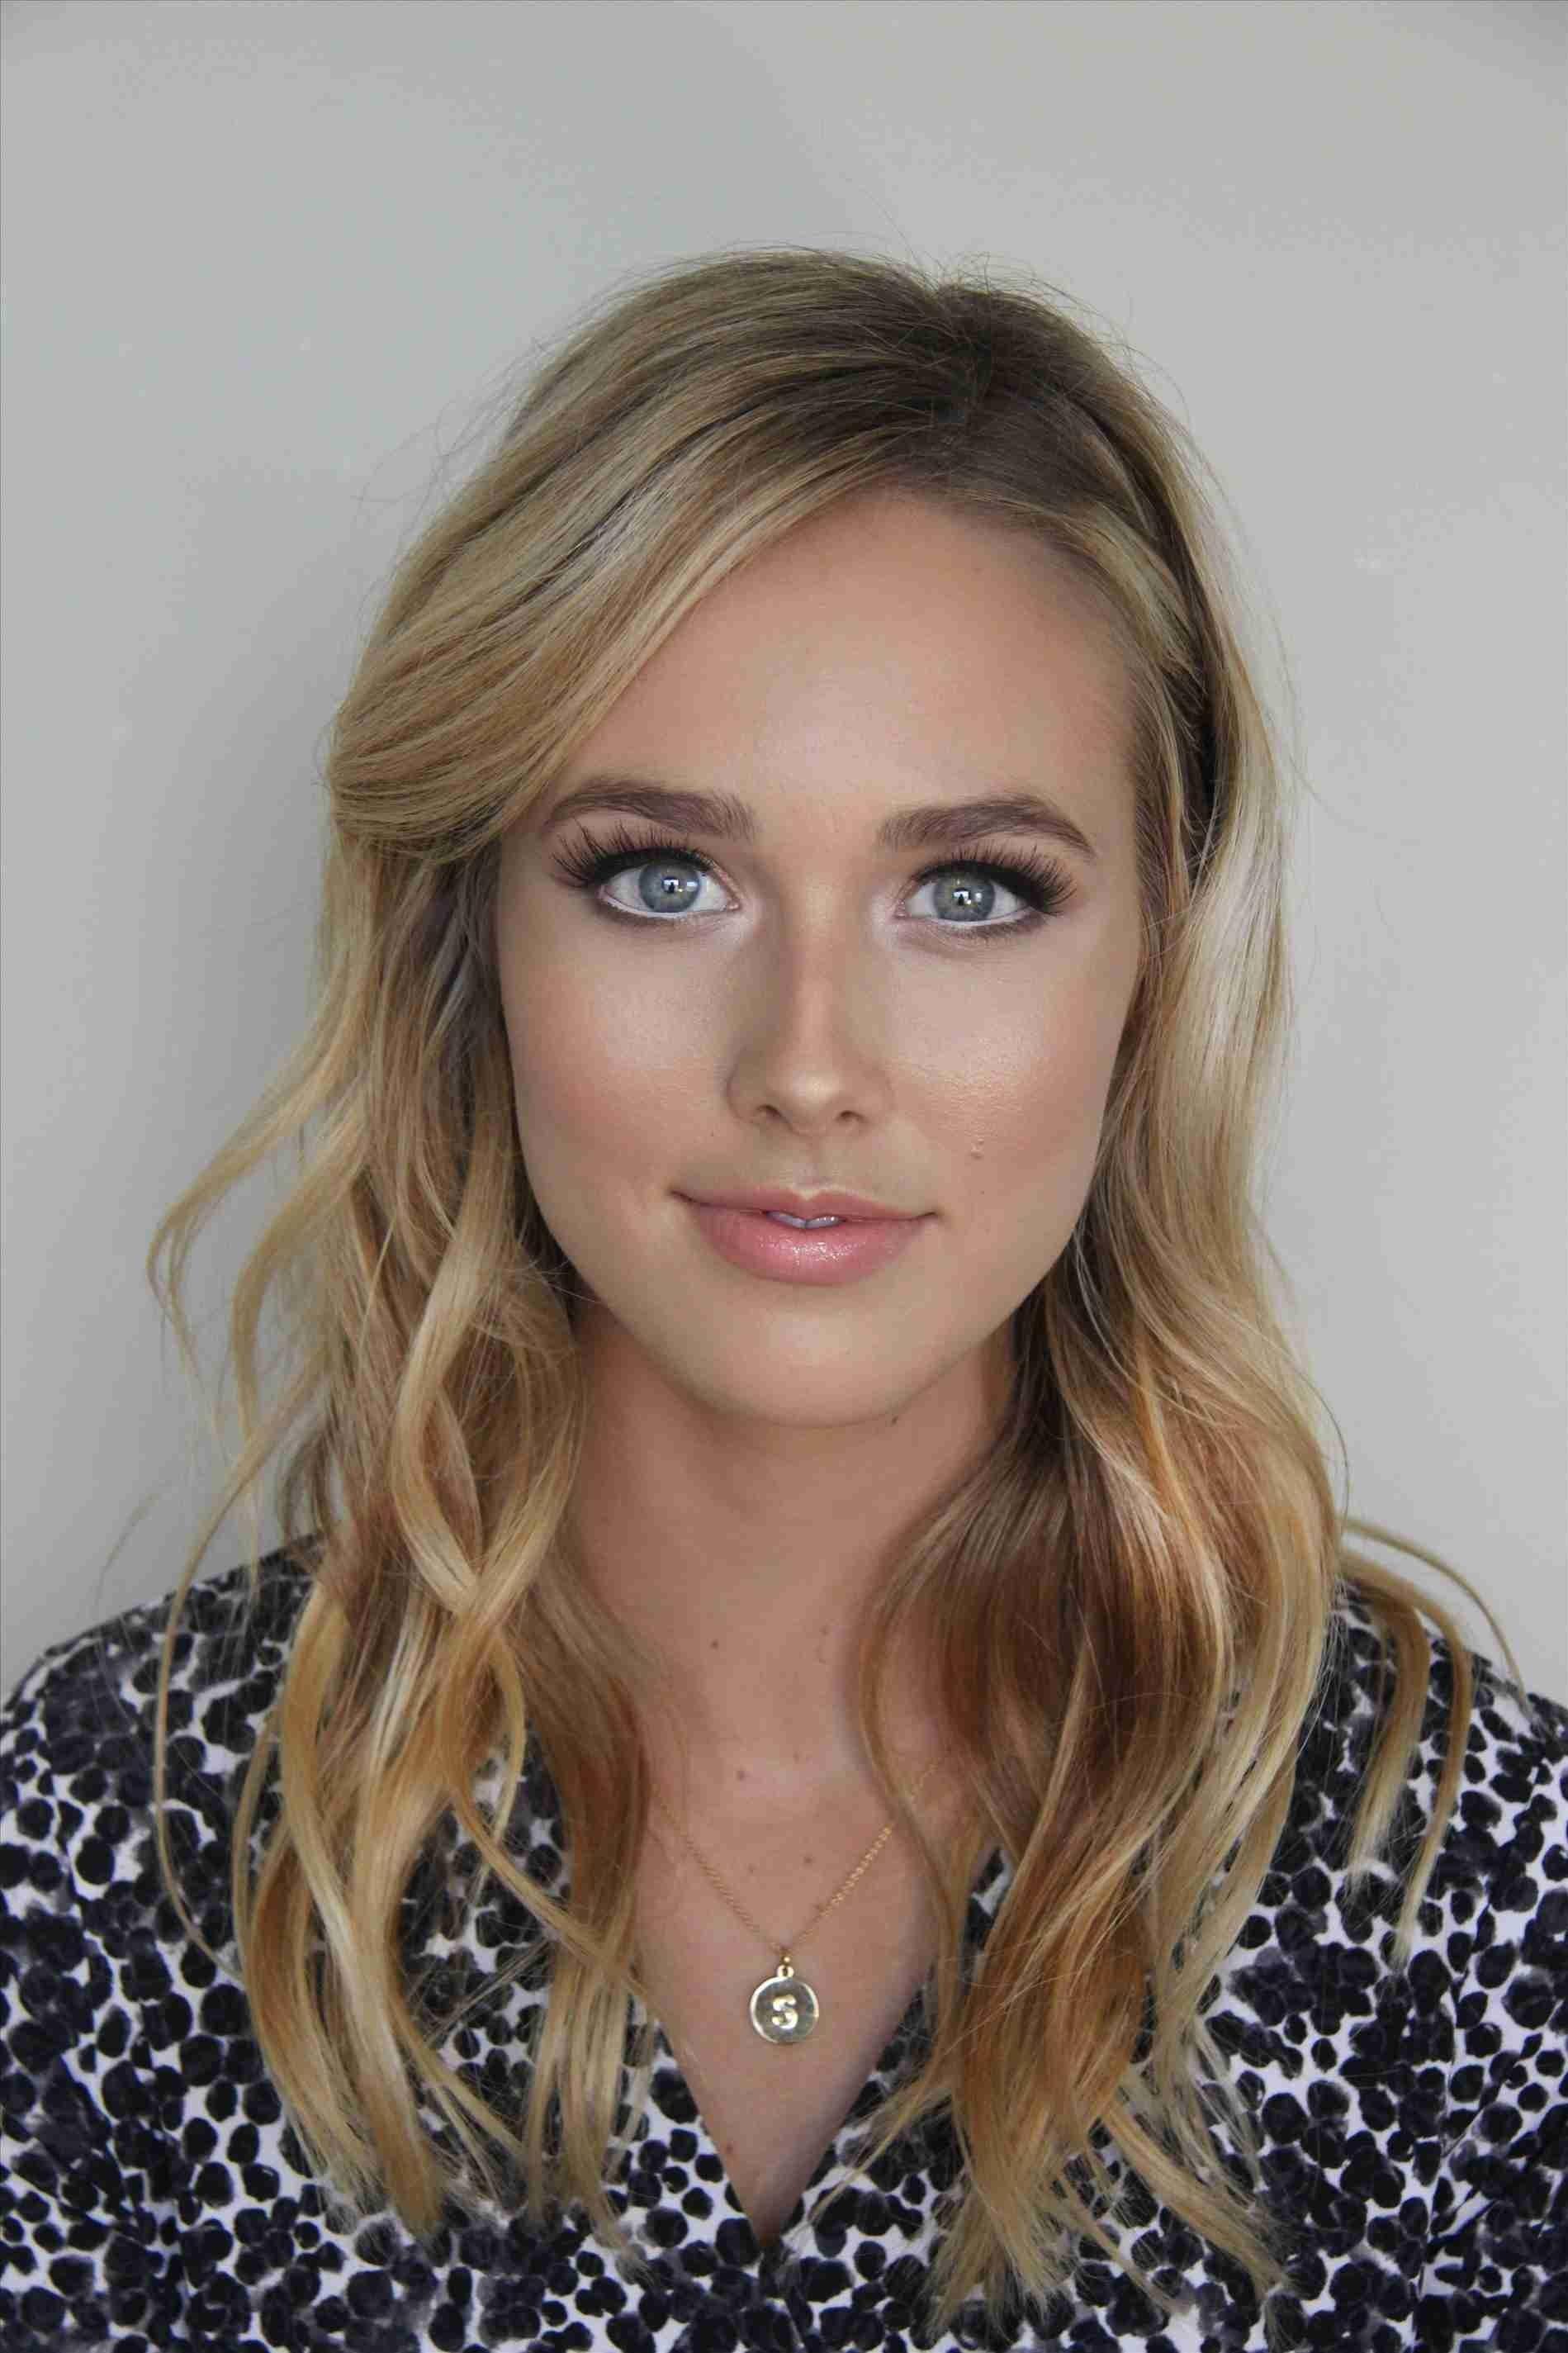 Makeup For Fair Skin And Hazel Eyes Makeup Virtual Fretboard